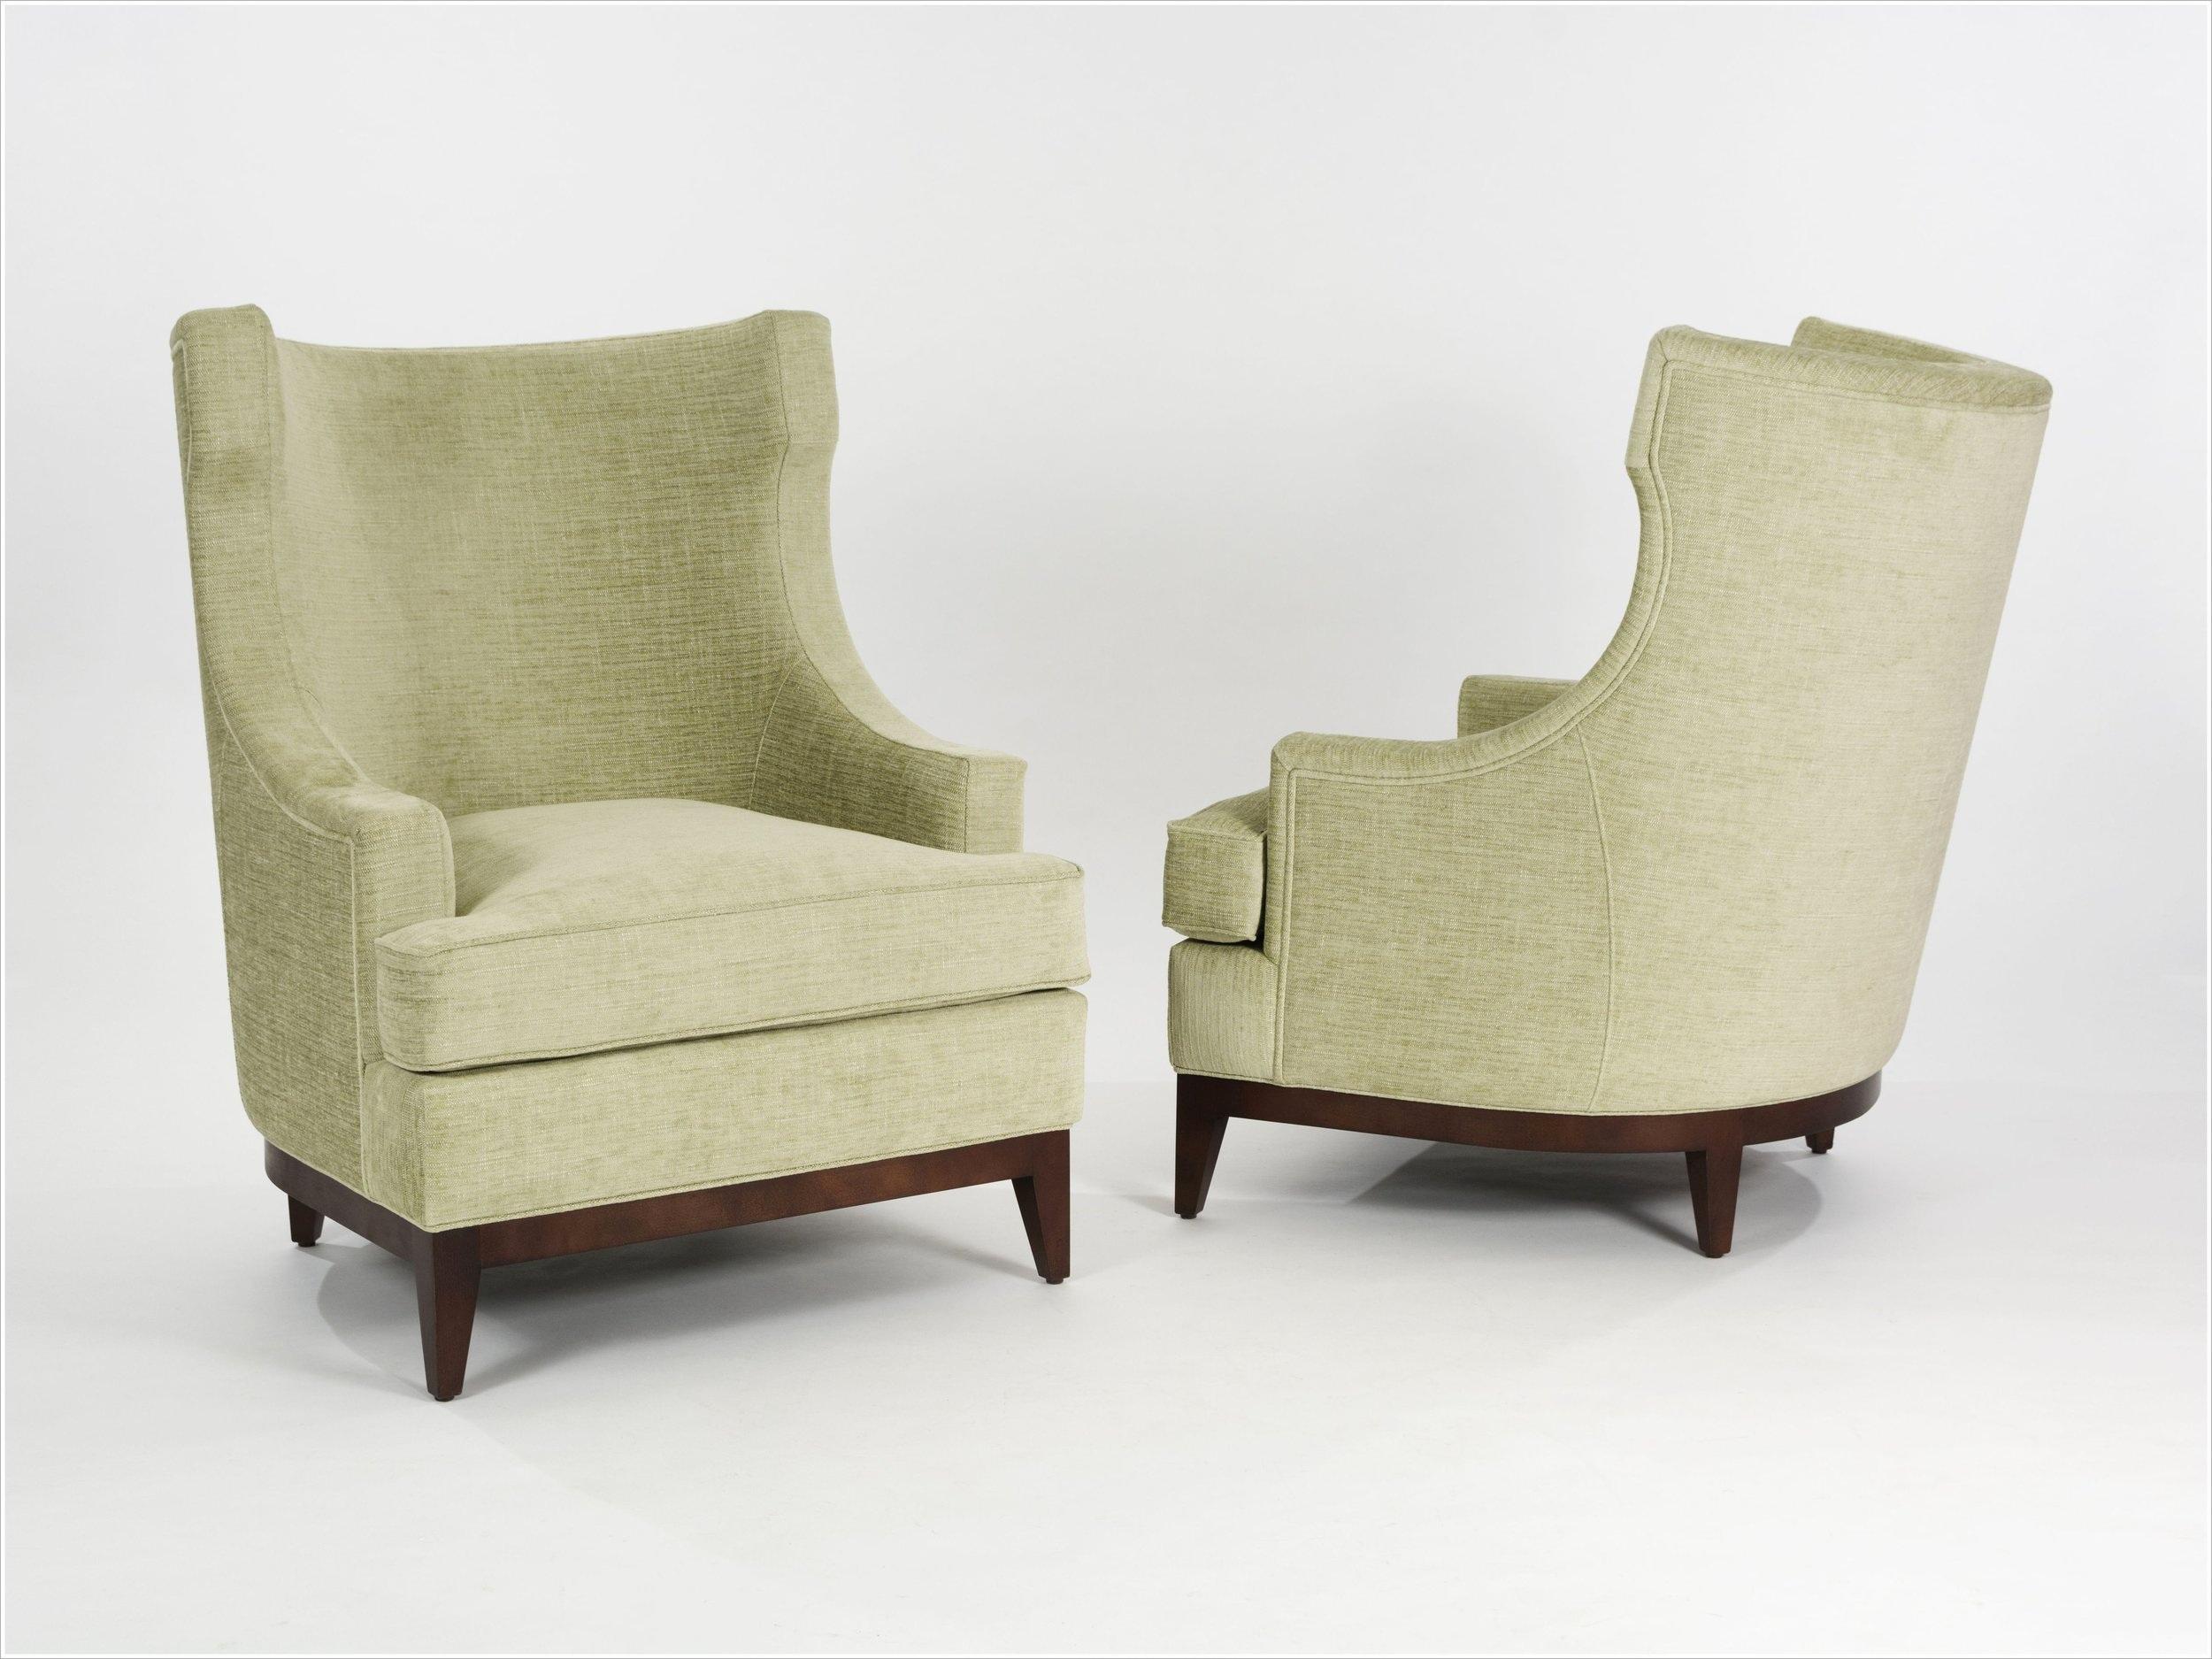 Custom Upholstered Lounge Chair